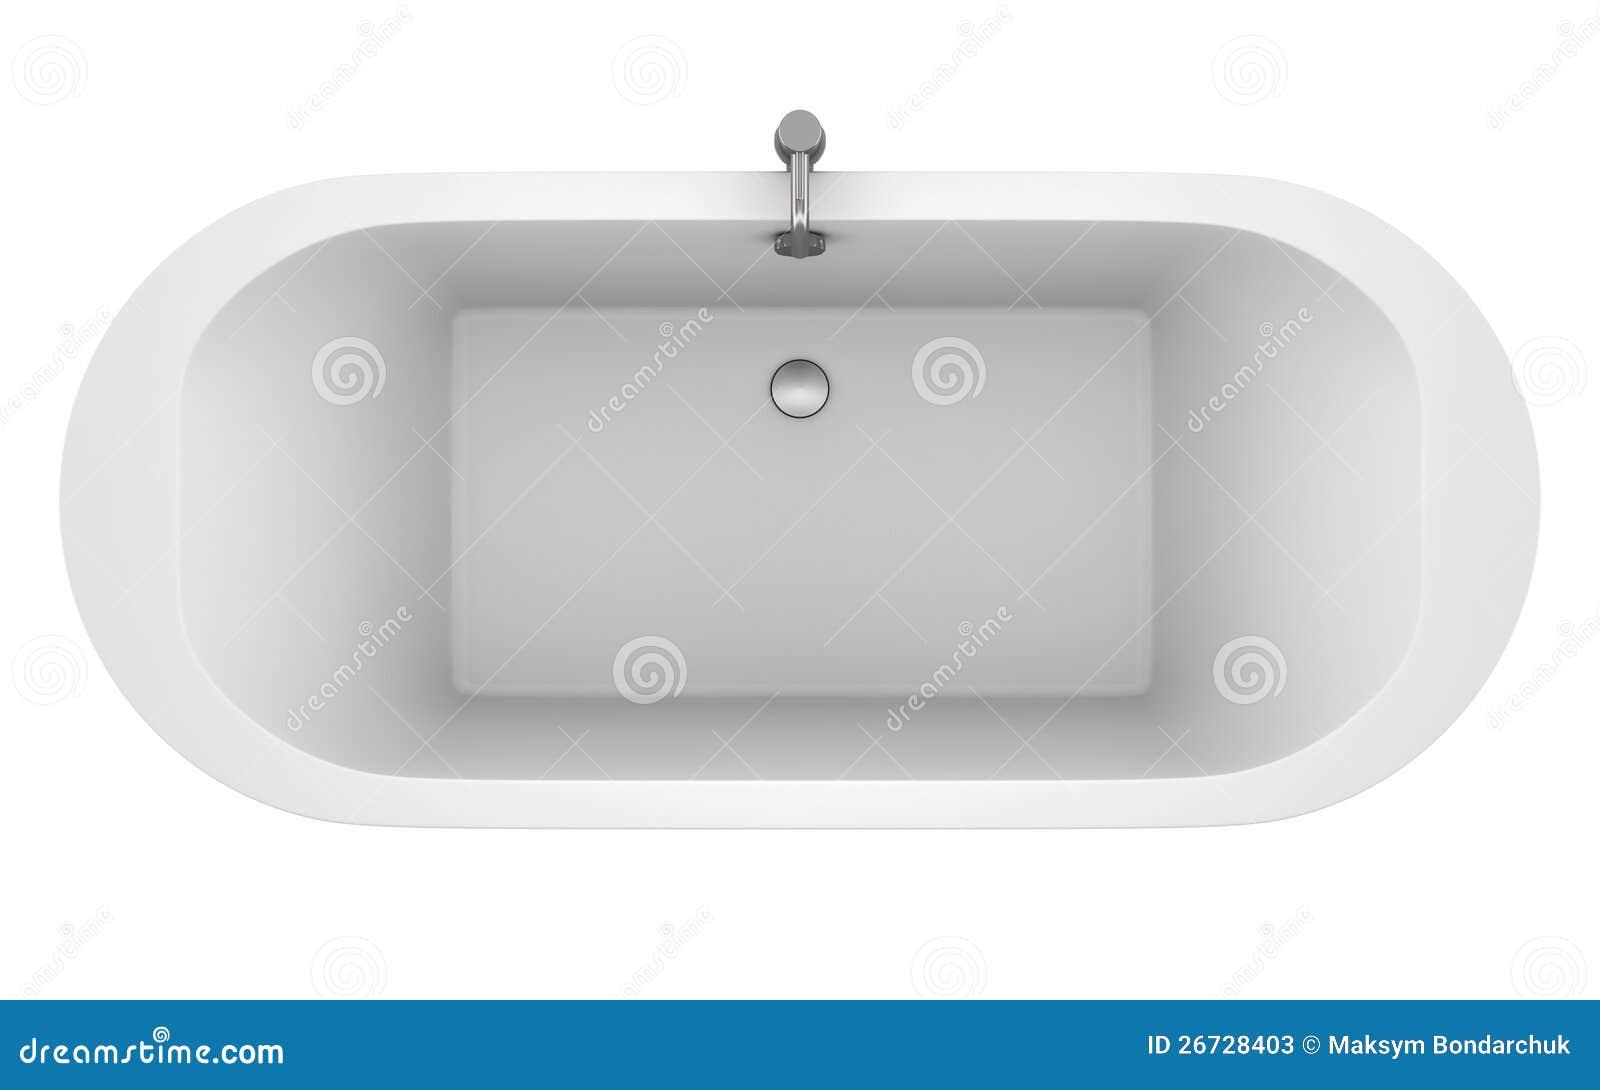 Top View Of Modern Bathtub Isolated On White Stock Photos